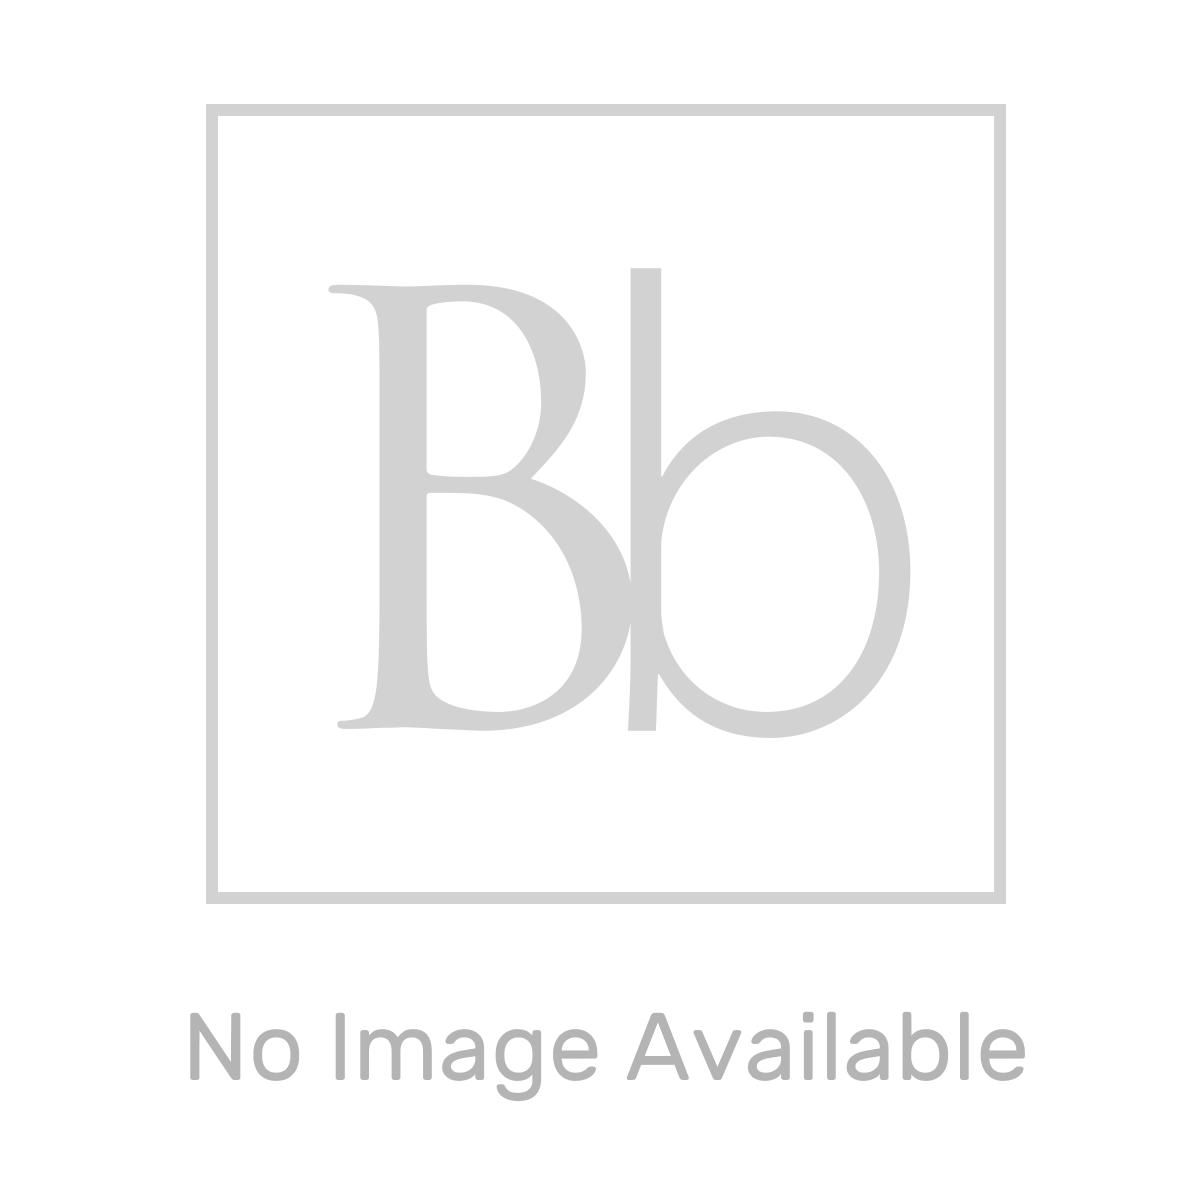 Homelux PVC Straight Edge 10mm White Tile Trim 2.5m